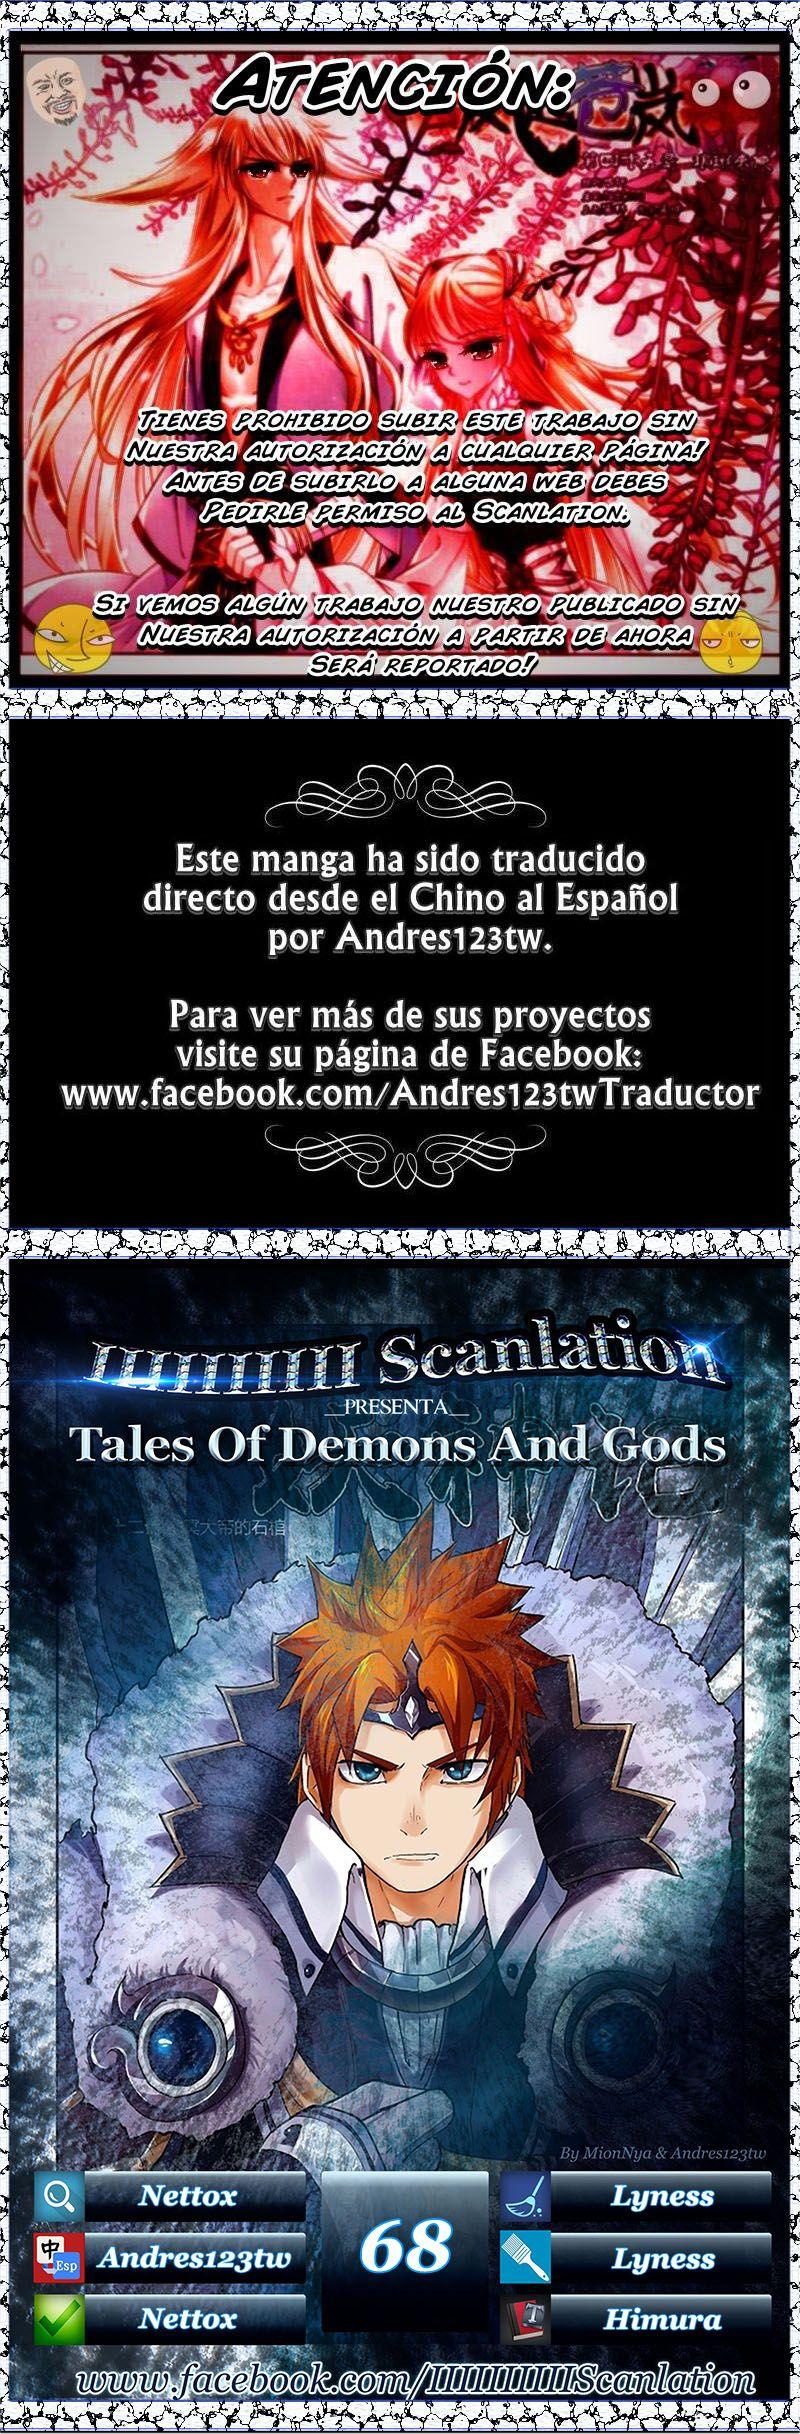 http://c5.ninemanga.com/es_manga/7/17735/452844/d71e13c019d57342db713bfbd1de0318.jpg Page 1